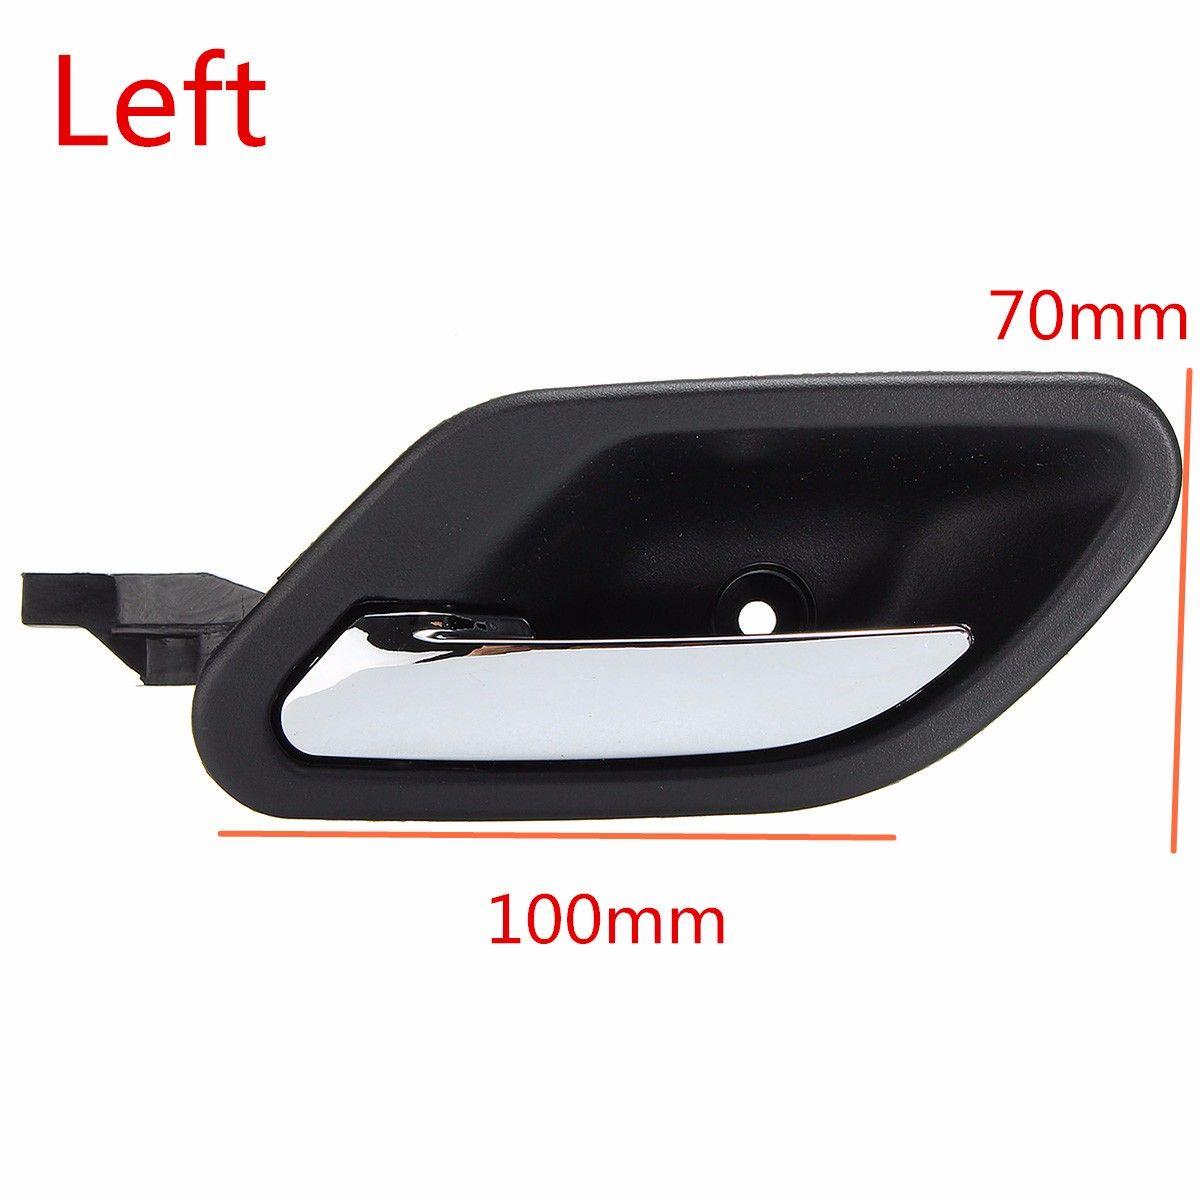 Black Inside Interior Chrome Door Handle Trim Front Left Side Rear For BMW E38 E39 5/7 Series 51218226049